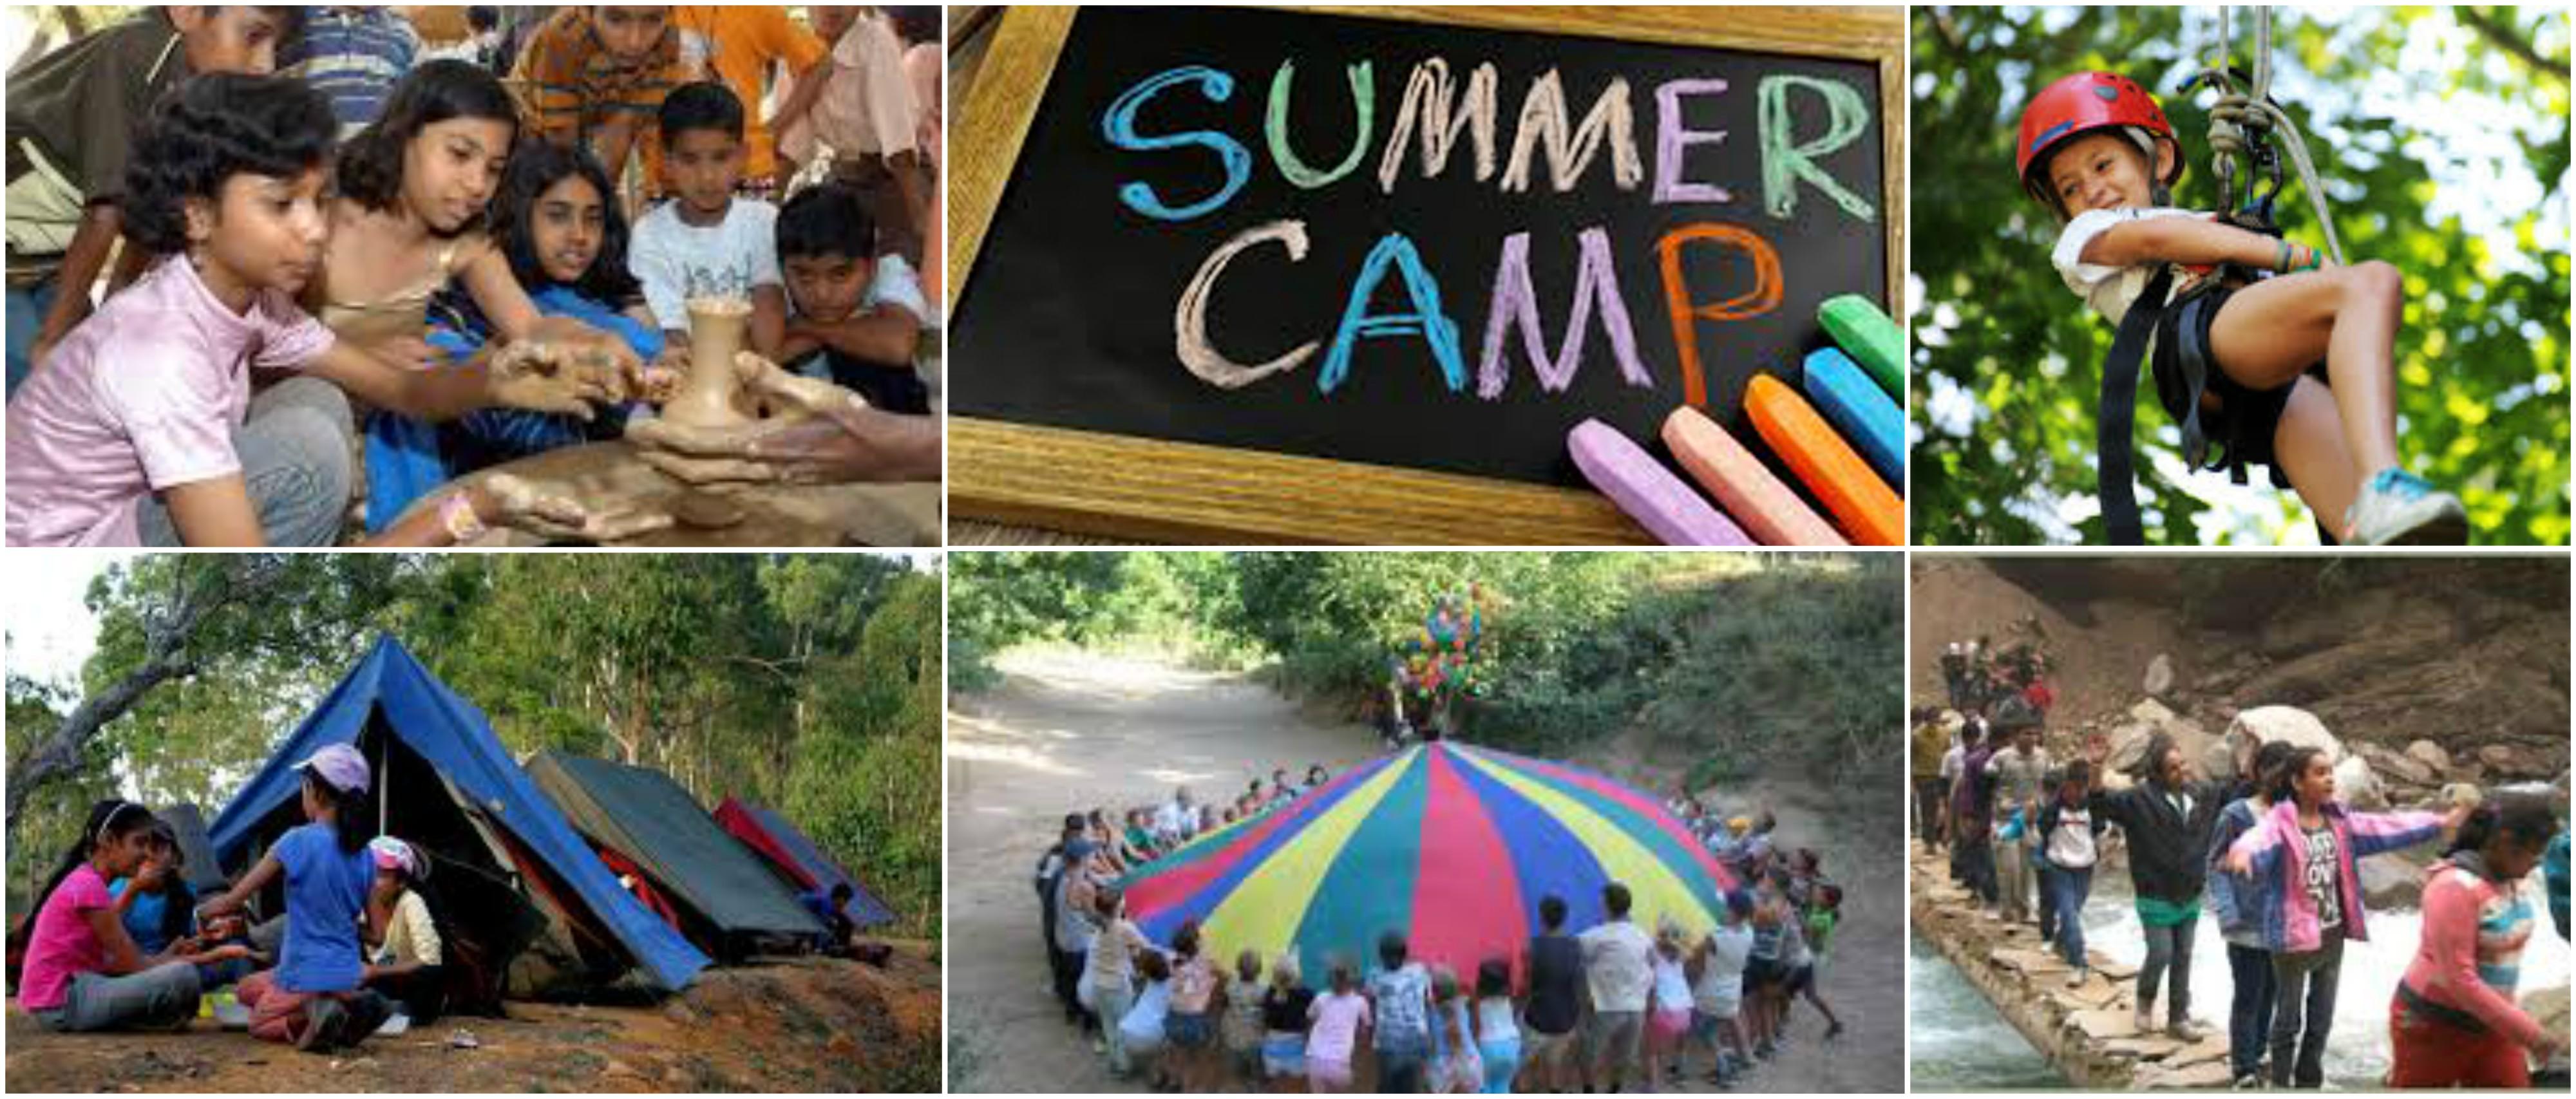 Summer camp ufv